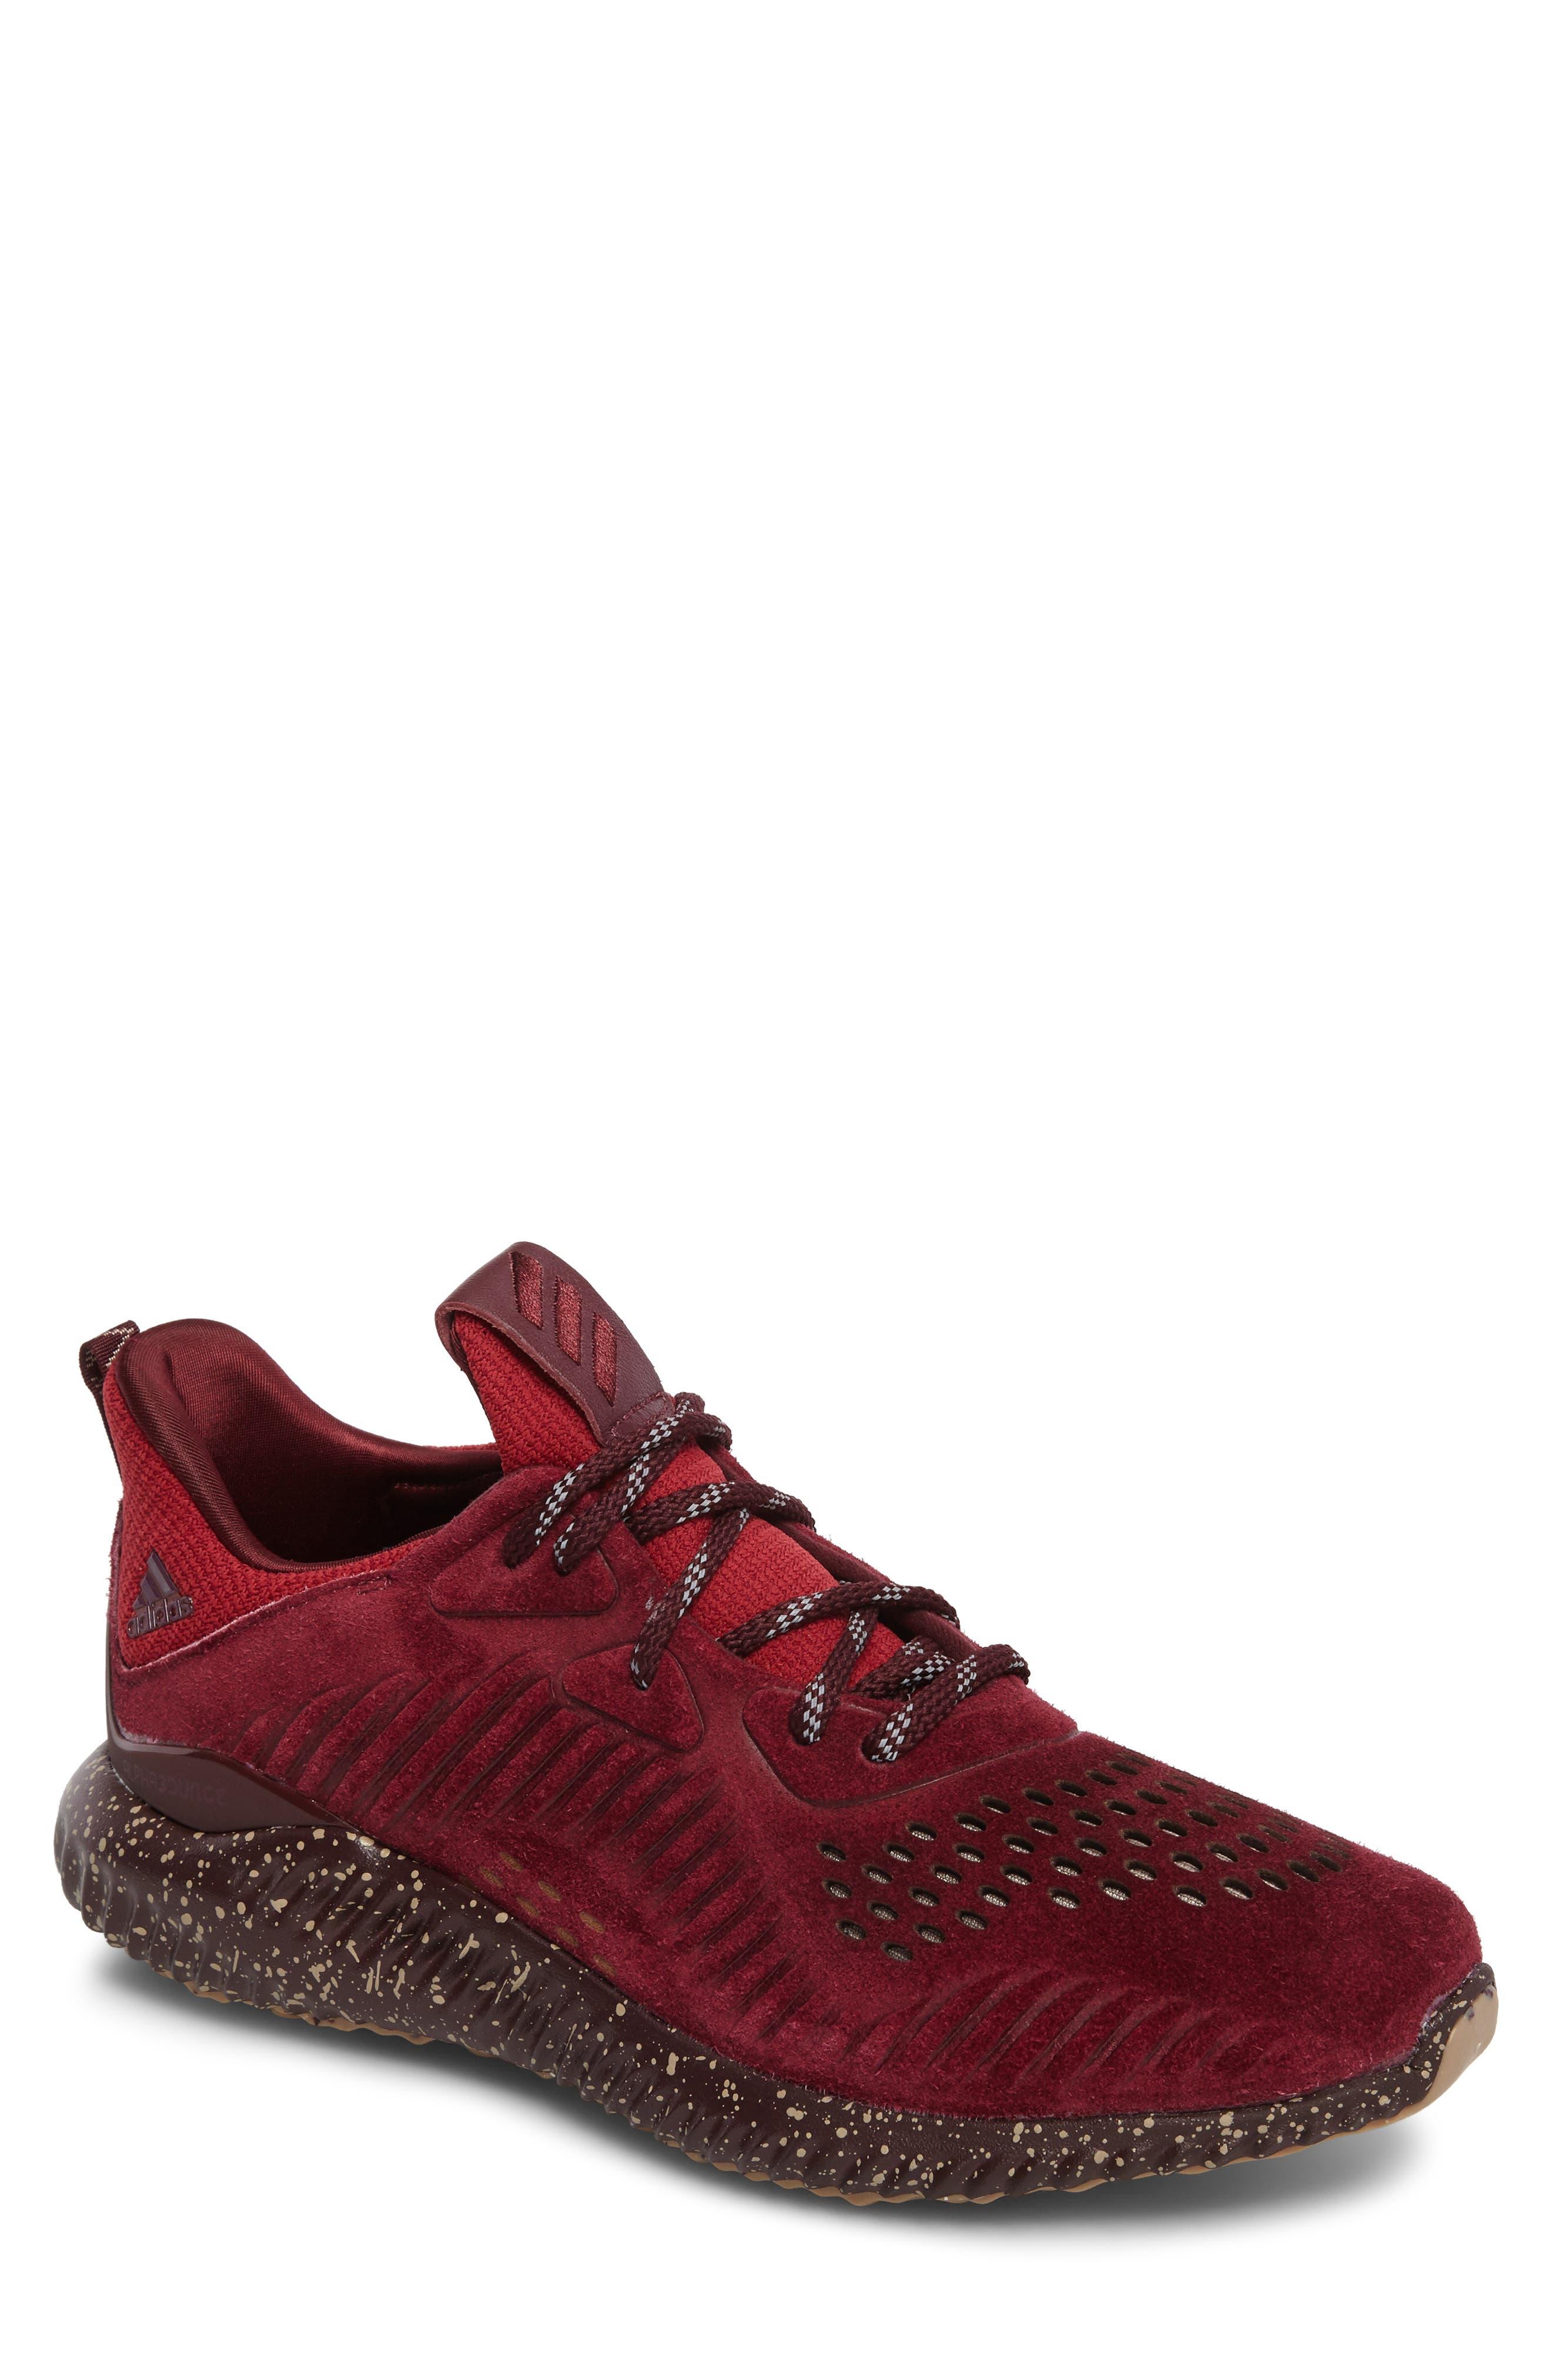 Main Image - adidas AlphaBounce LEA Running Shoe (Men)